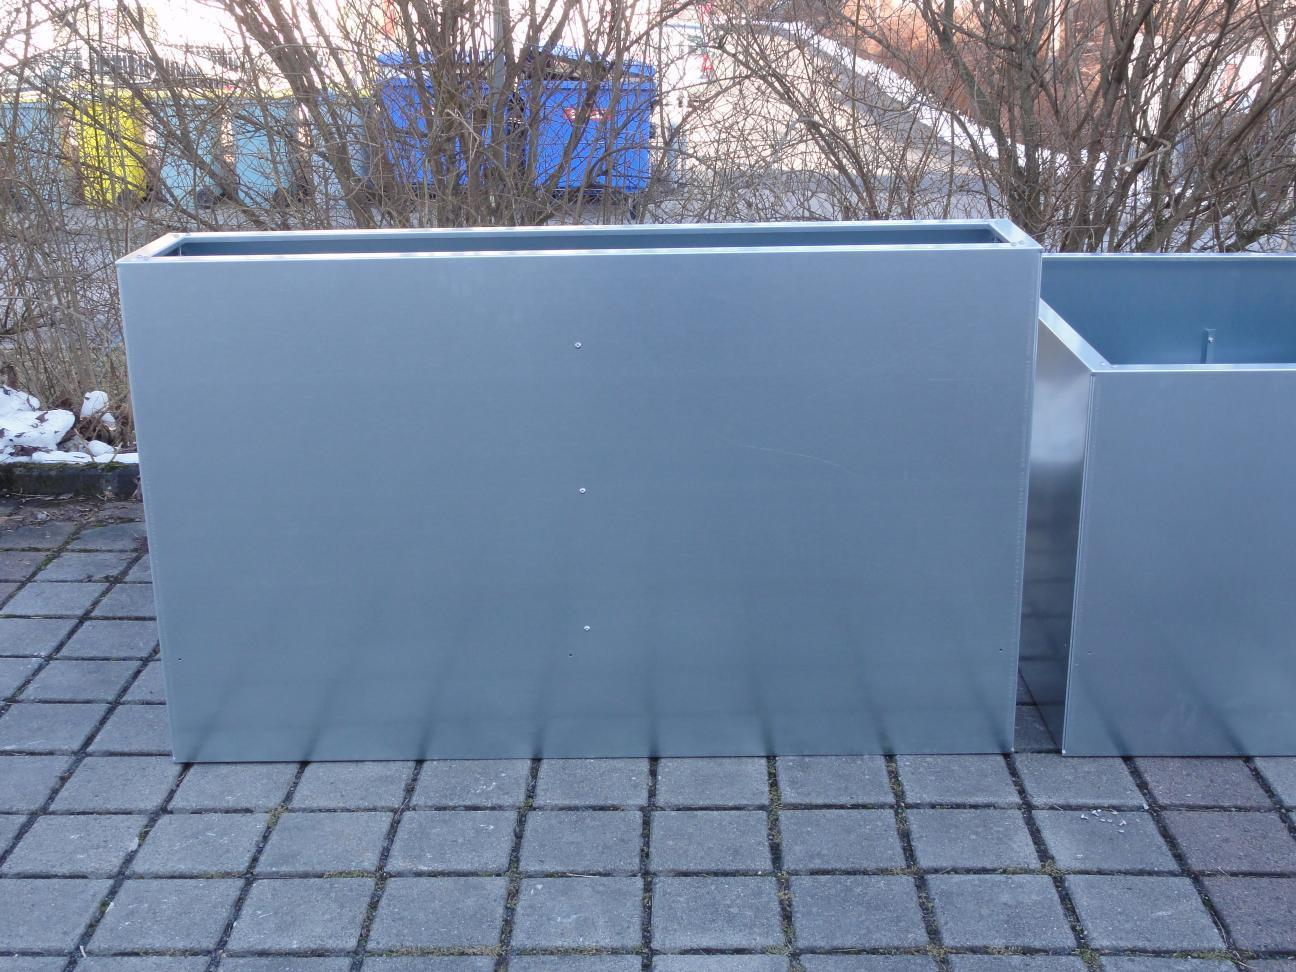 Hochbeet Urban Metall 1 1m X 1 1 M Hohe 0 7 M Verzinkt